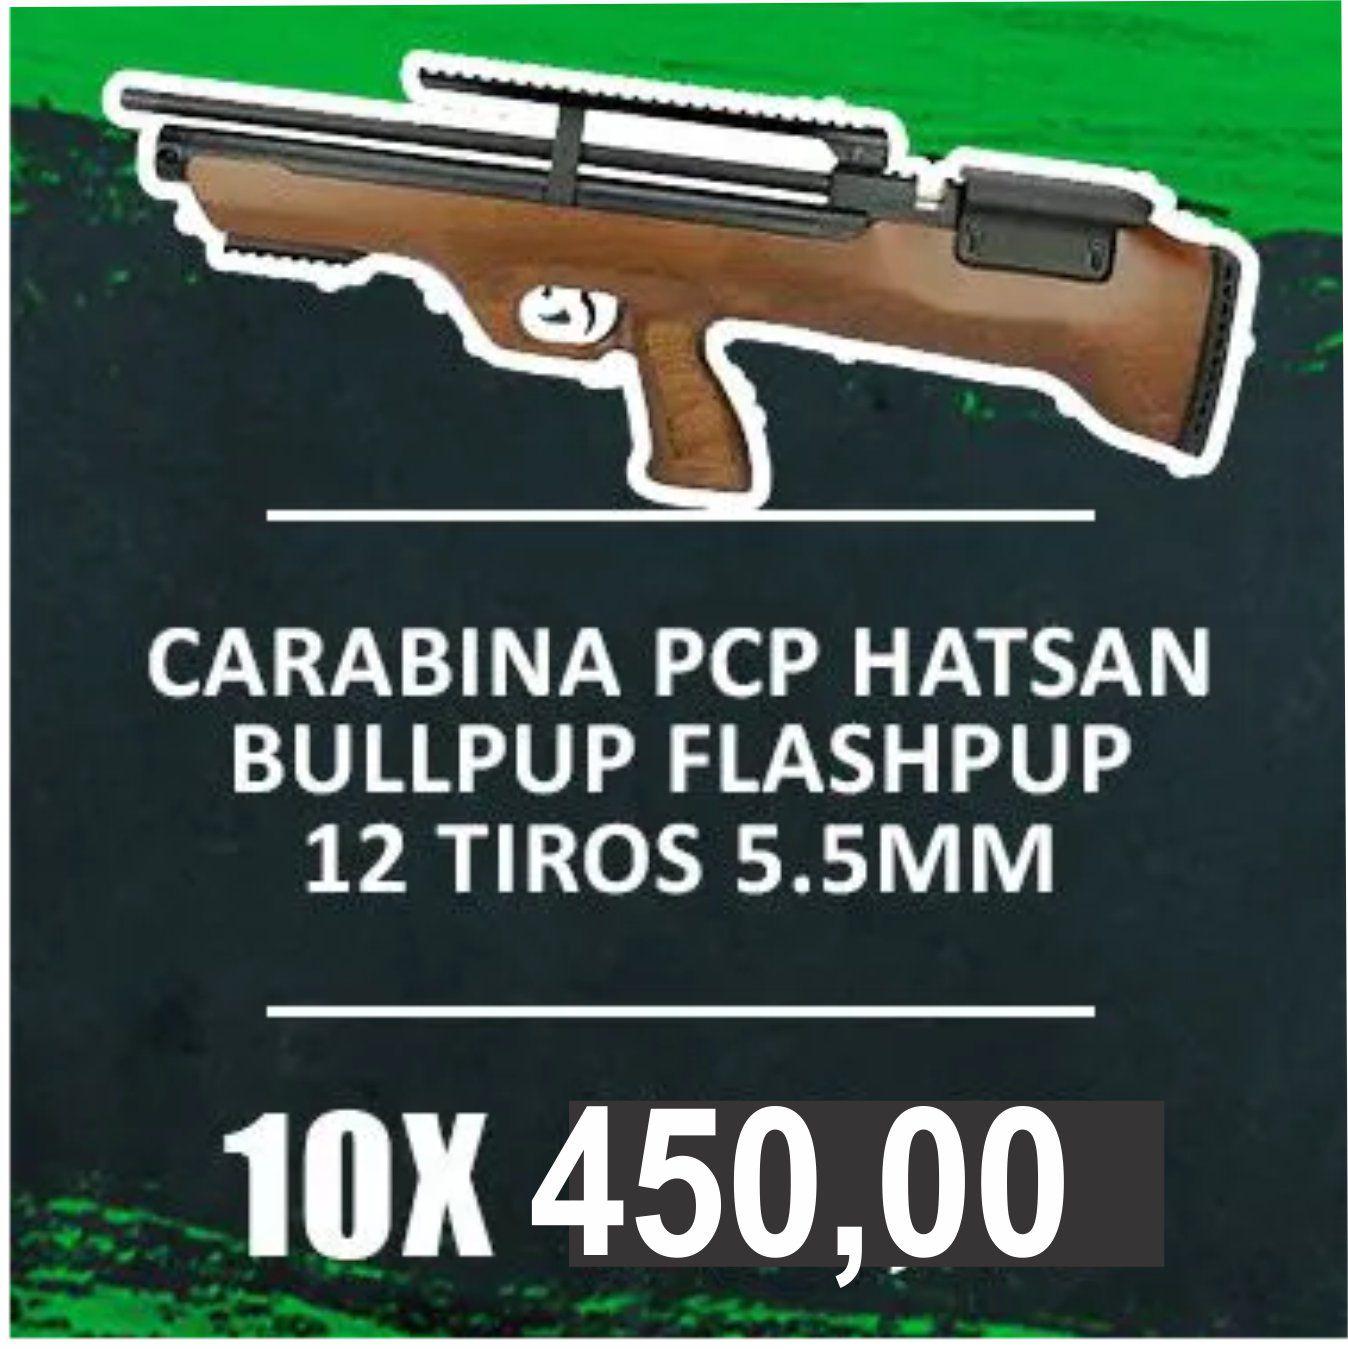 Consórcio - Carabina Pressão Hatsan PCP Bullpup Flashpup 12 tiros 5.5mm